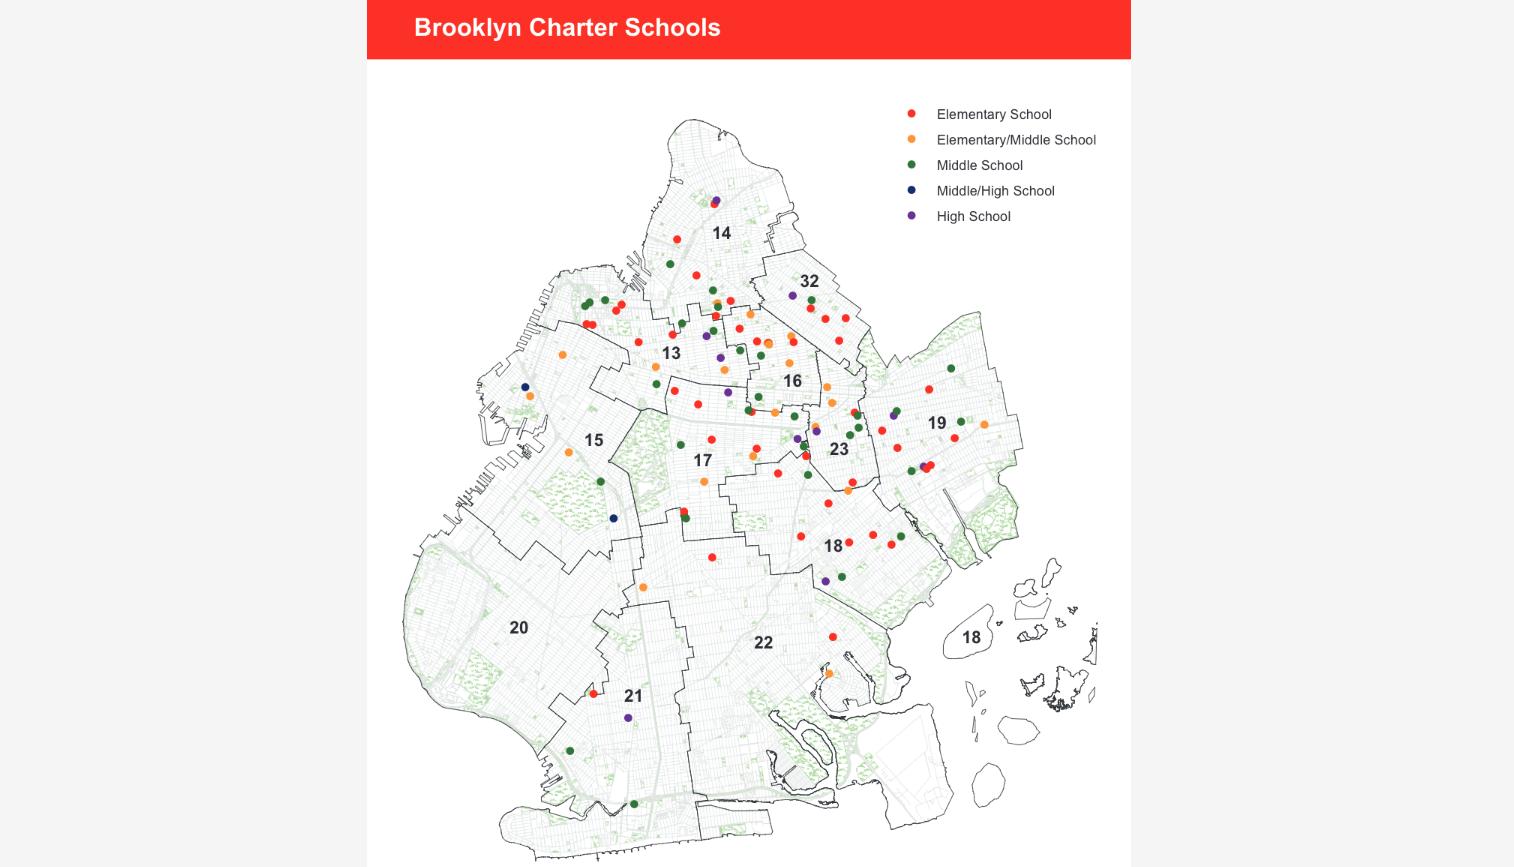 map of Brooklyn Charter Schools